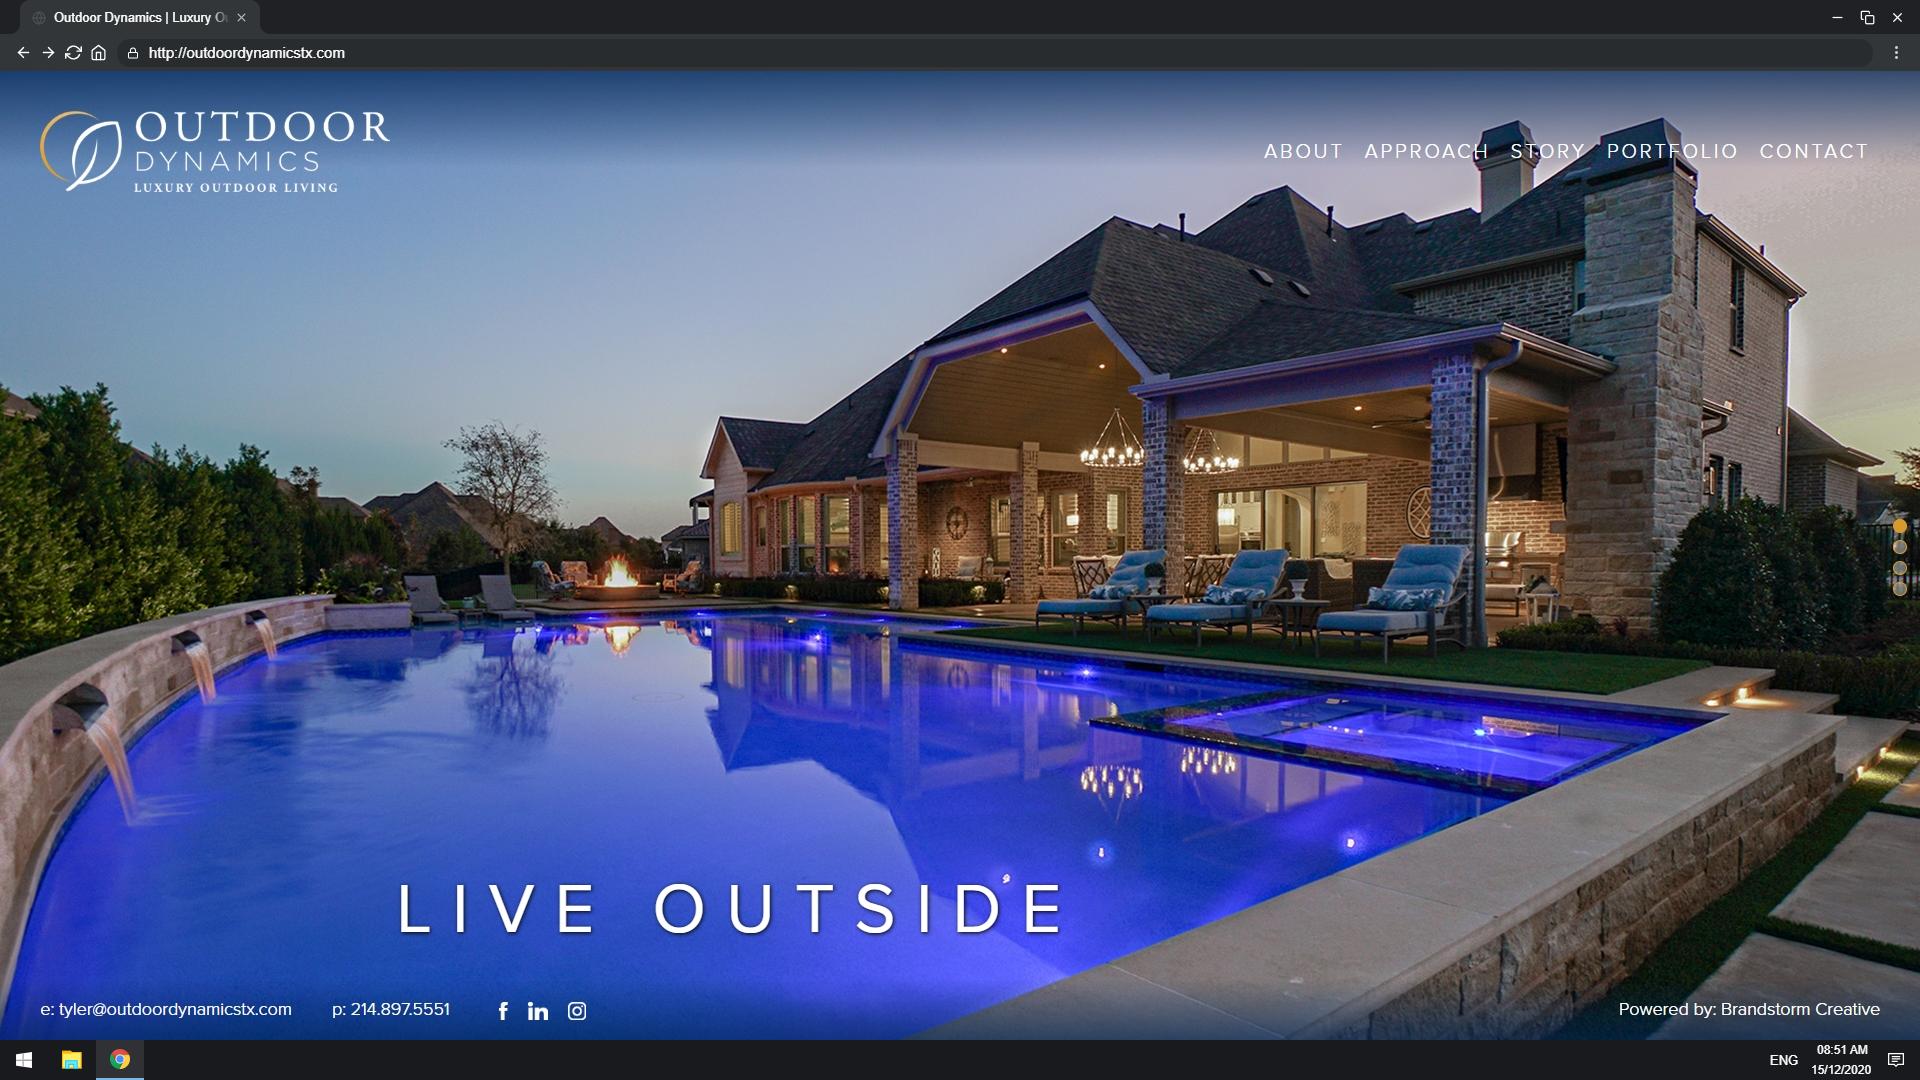 Mock up of Outdoor Dynamics website